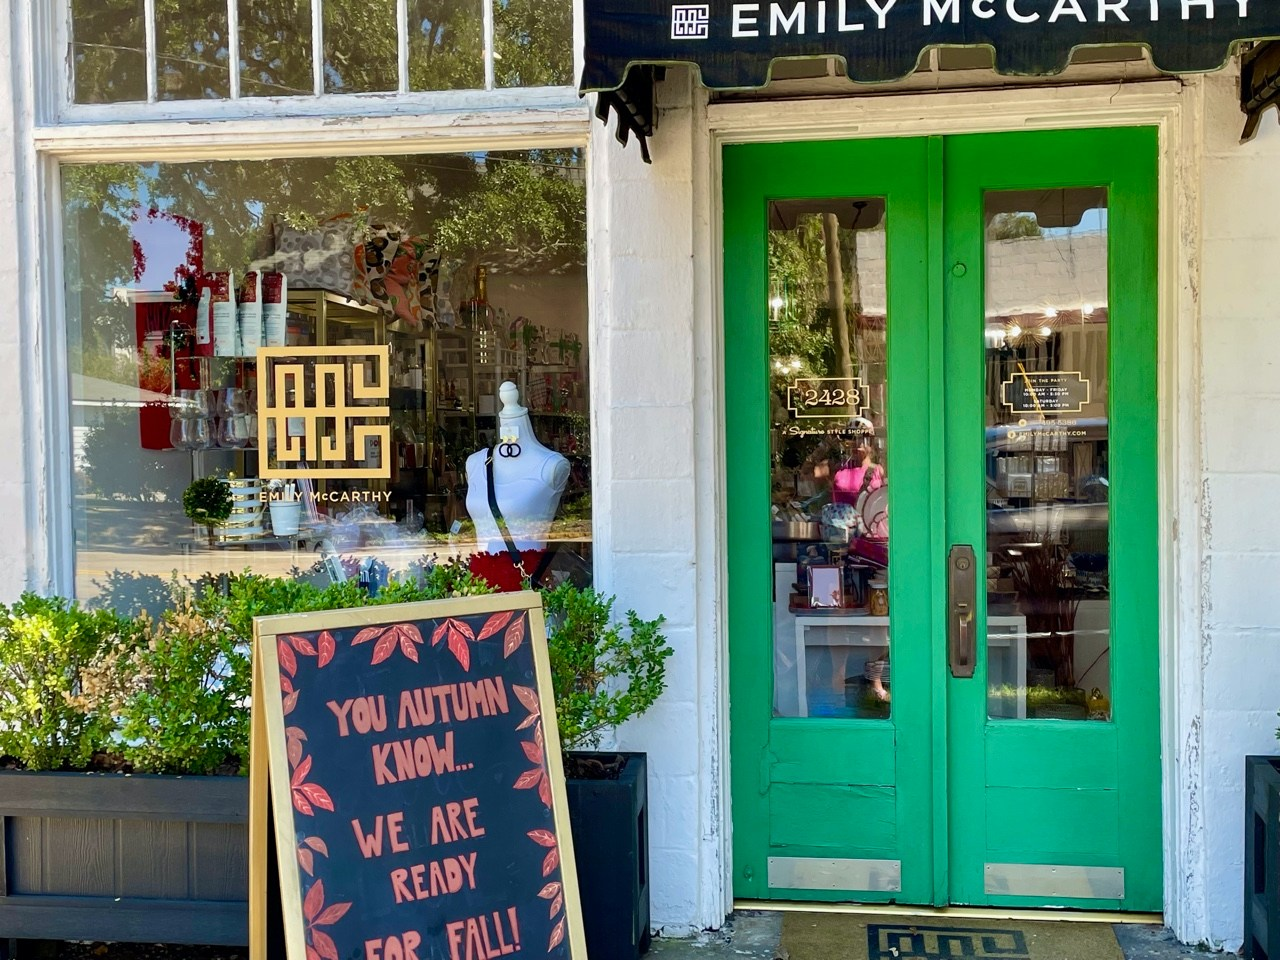 Emily McCarthy post